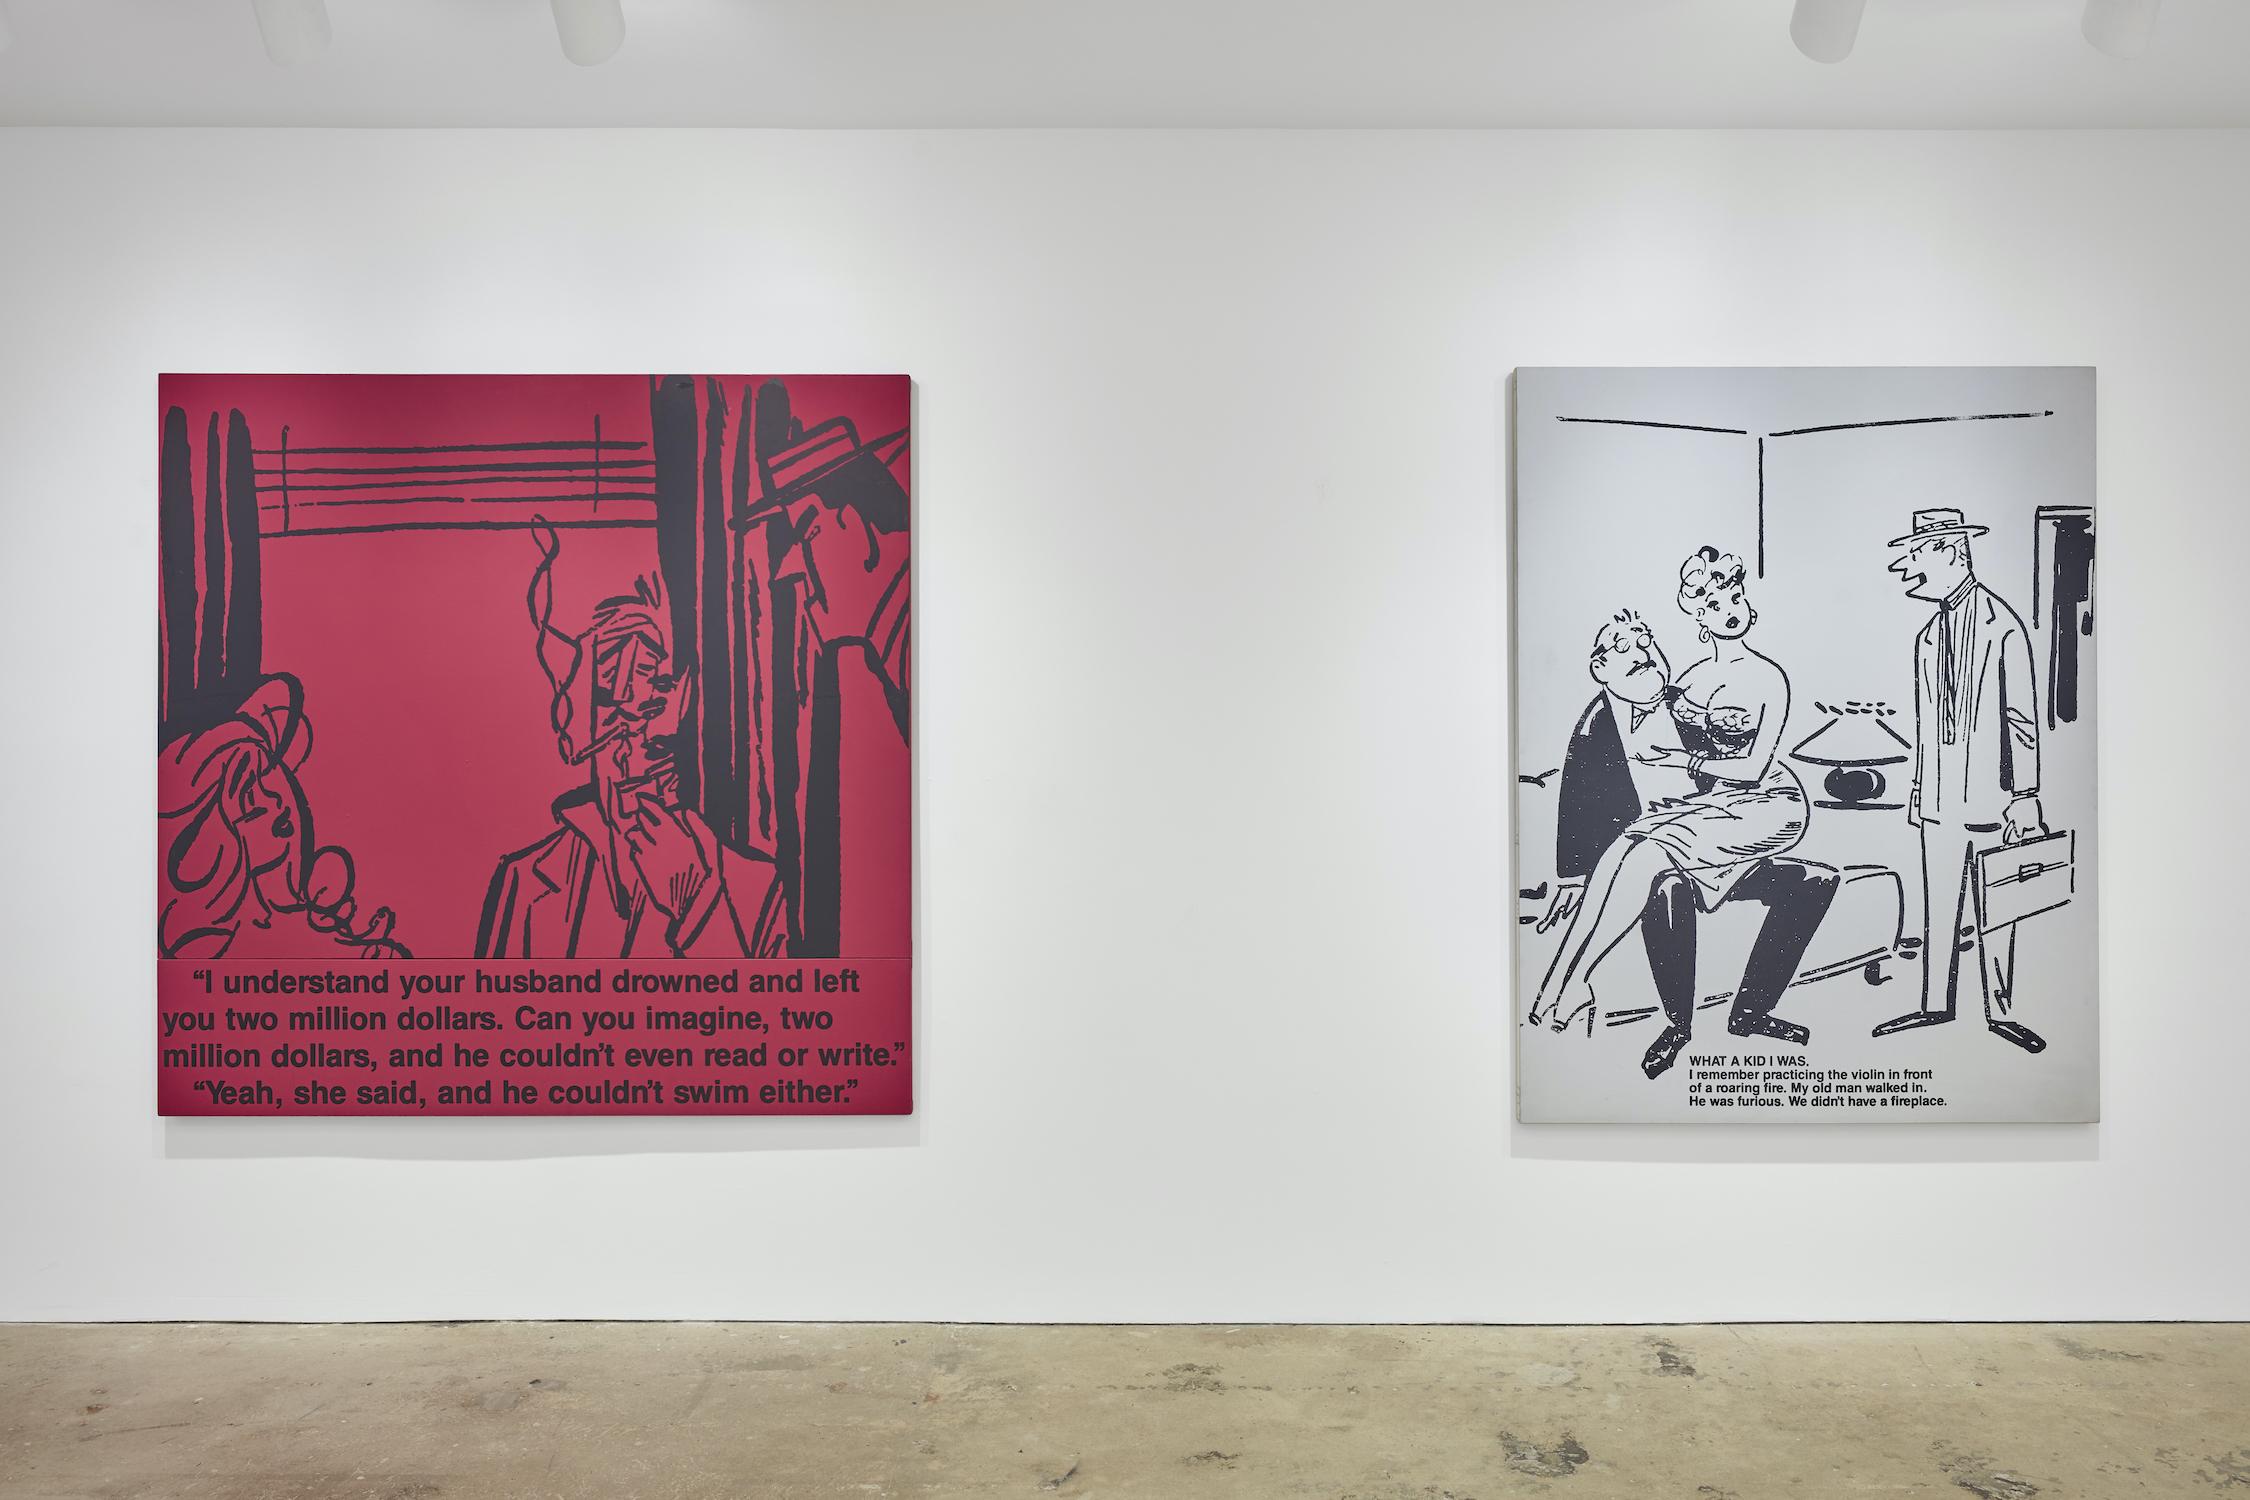 Installation view 5, Richard Prince: Cartoon Jokes, 2020, Courtesy of Nahmad Contemporary